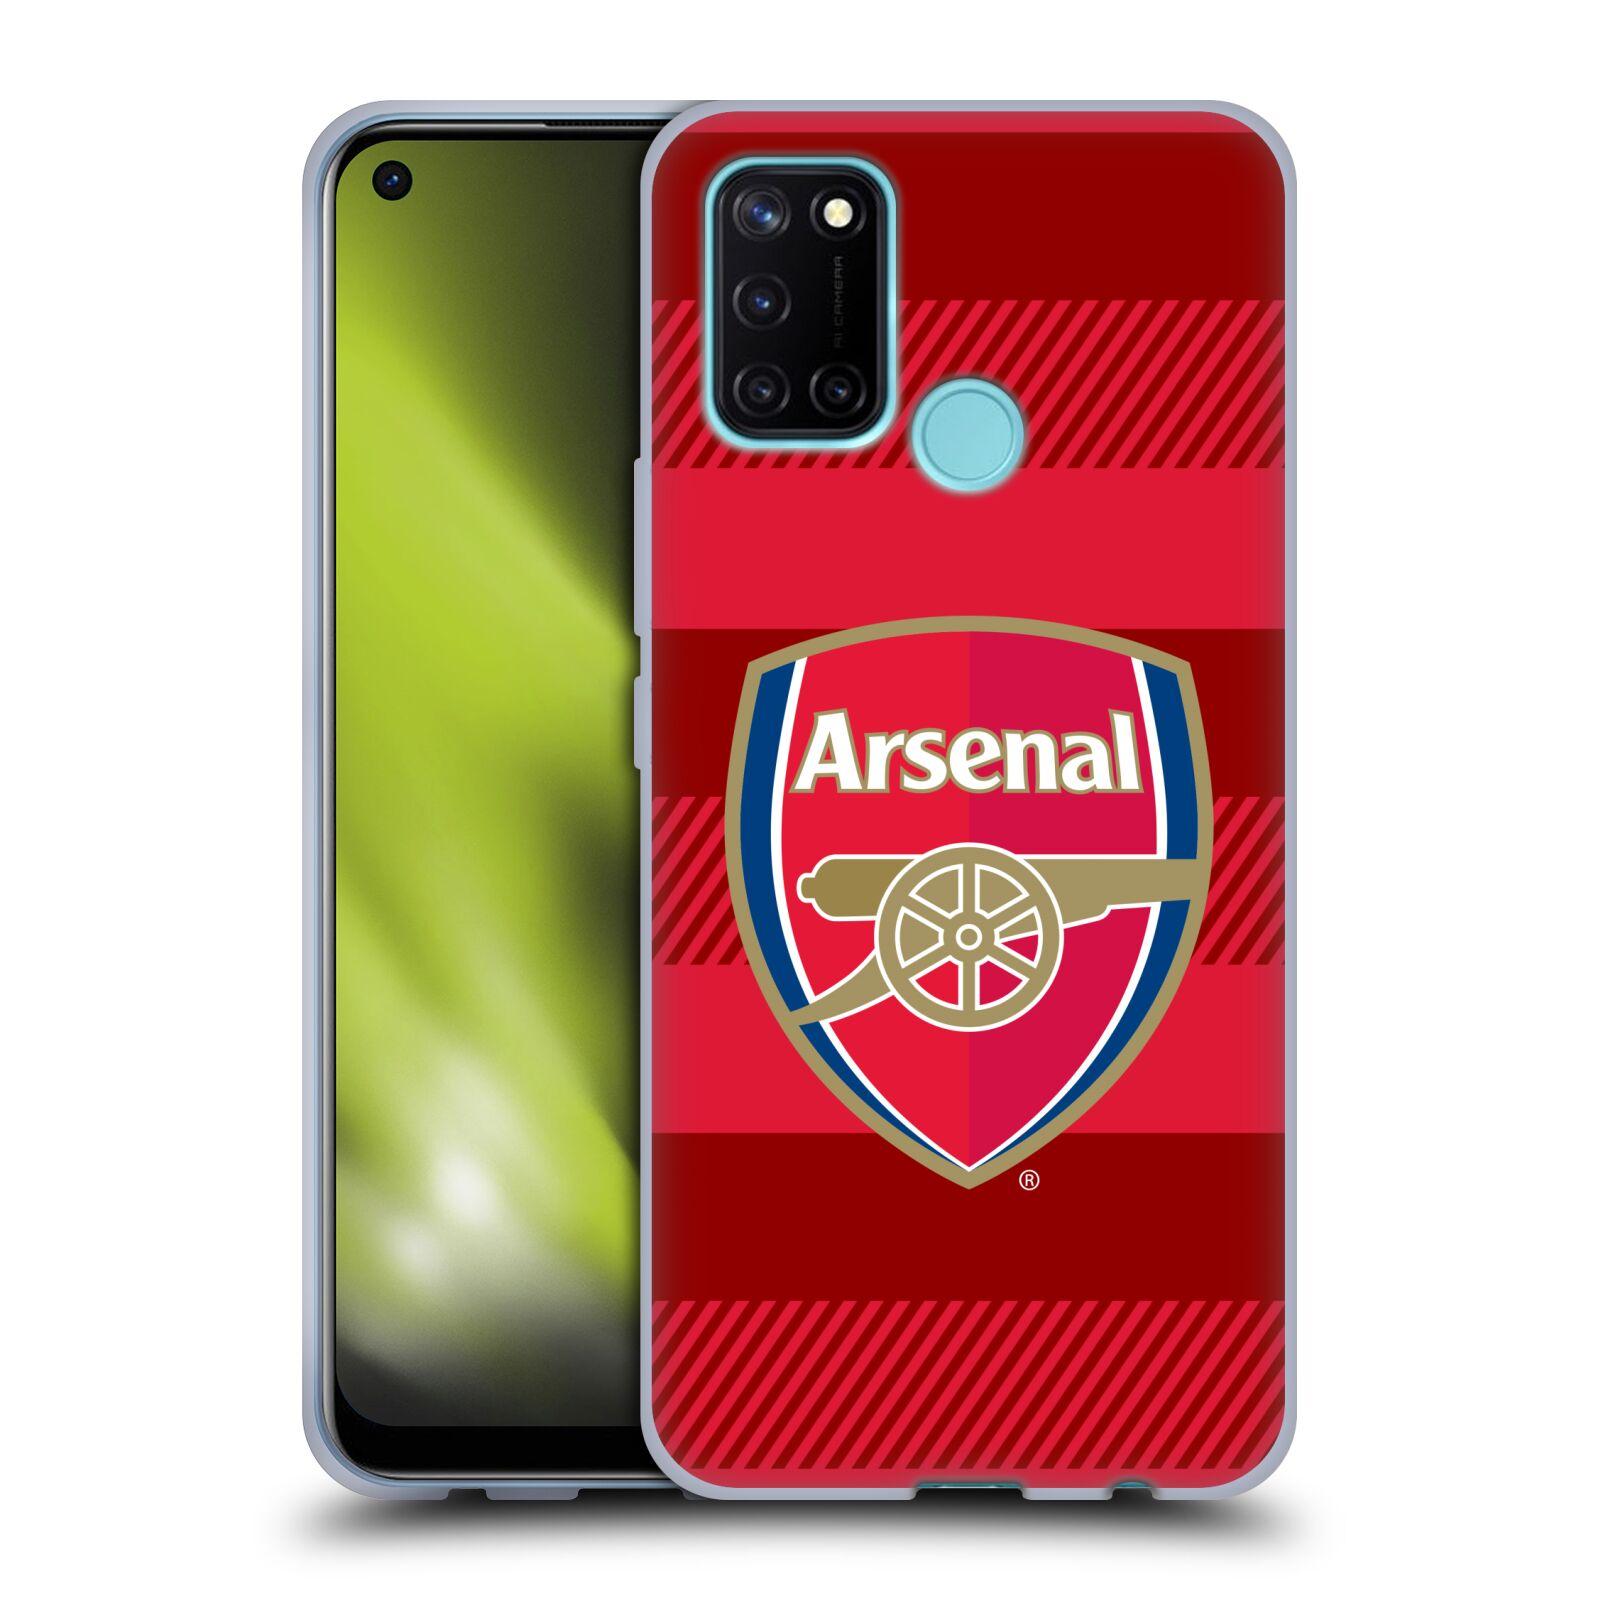 Silikonové pouzdro na mobil Realme 7i - Head Case - Arsenal FC - Logo s pruhy